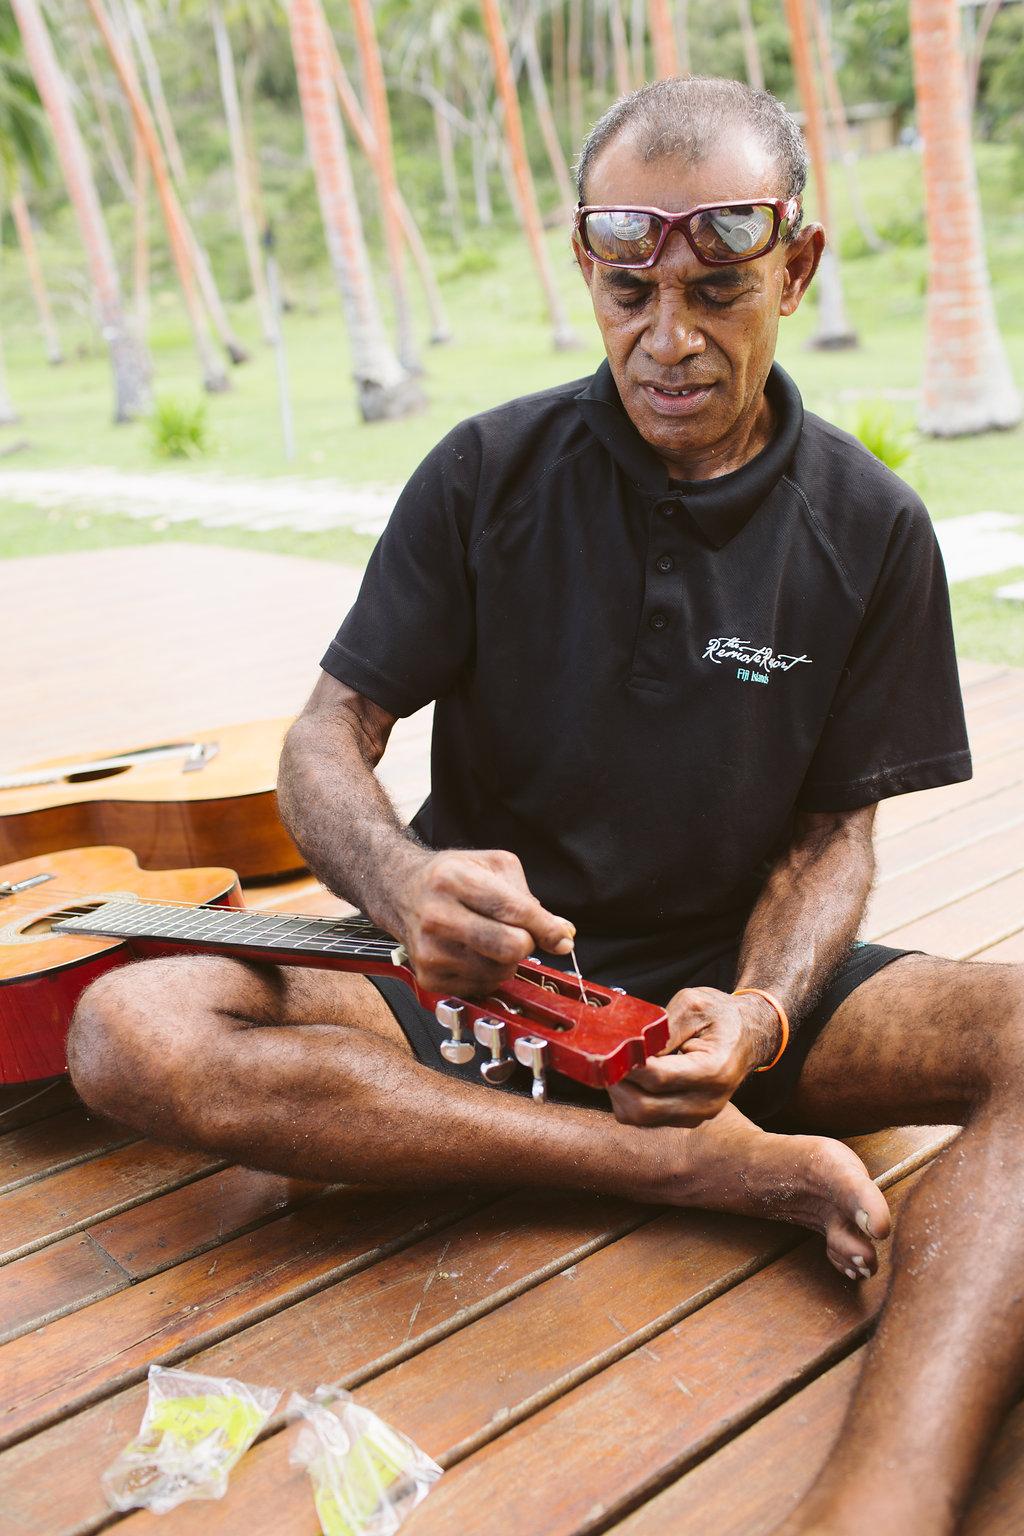 Fiji Wedding Preparation- The Remote Resort Fiji Islands - Off the beaten path ceremonies